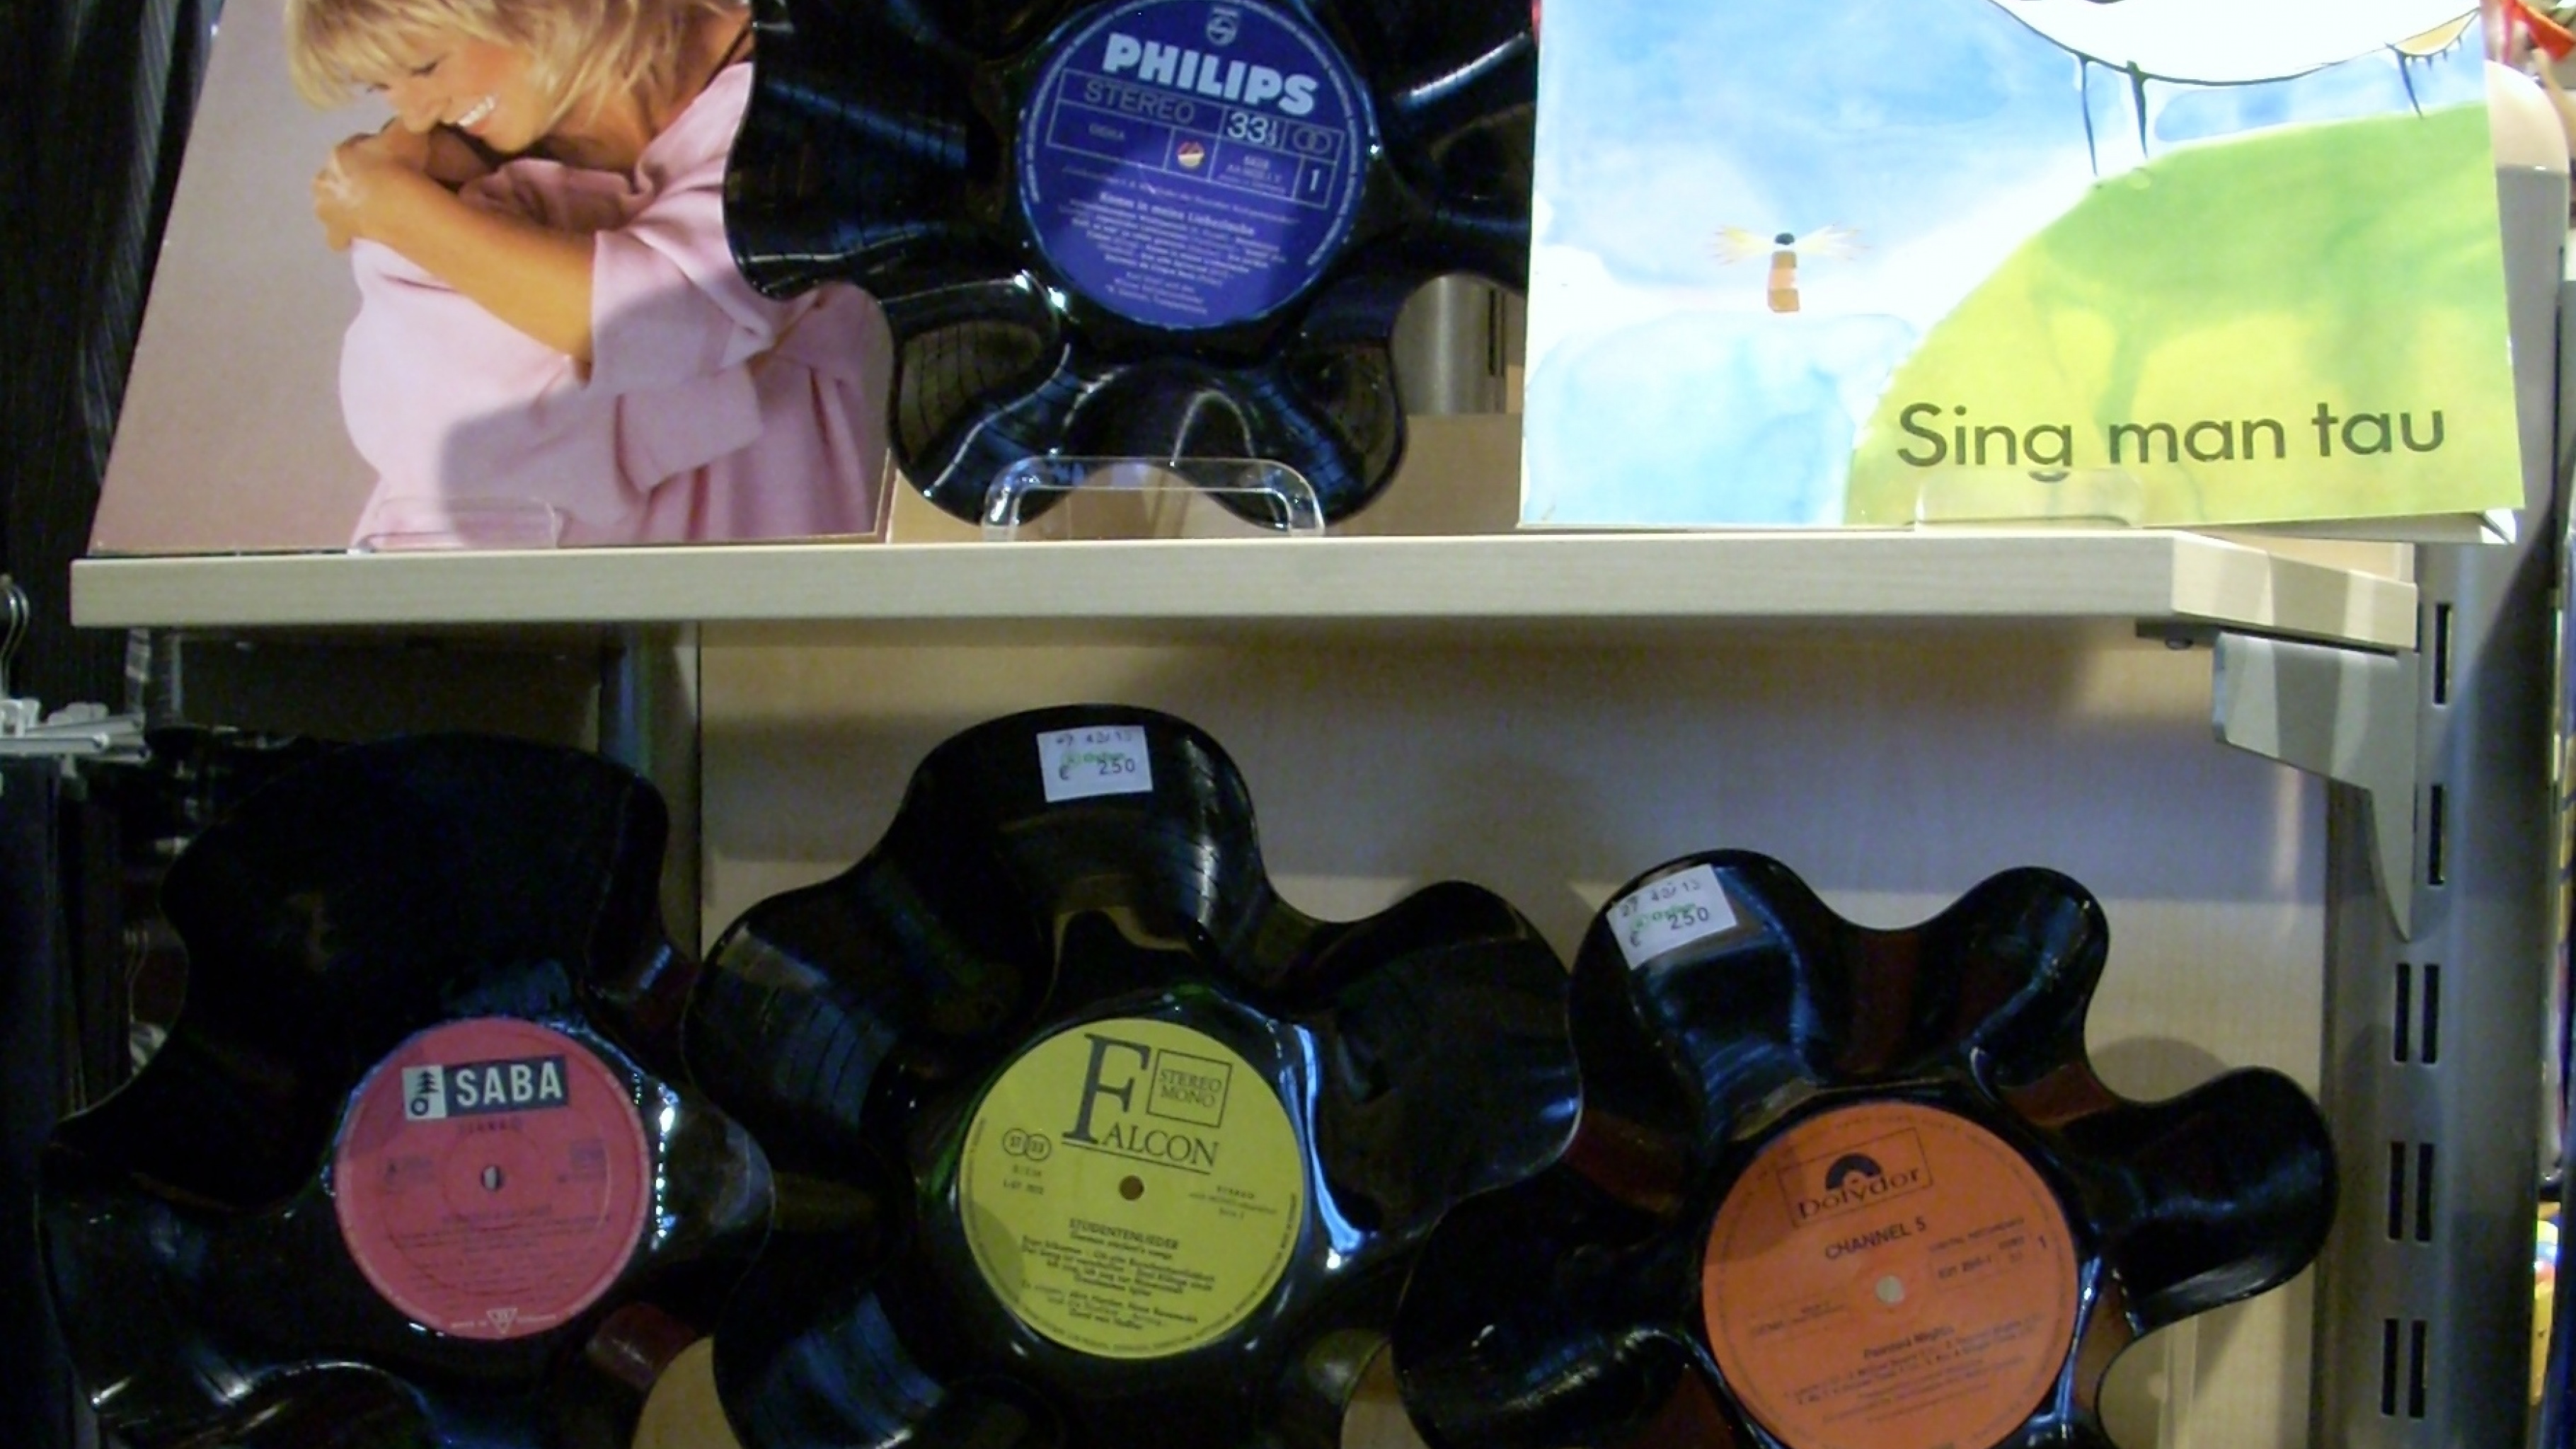 Oxfam Shop Göttingen -  Schalen gefertigt aus Schallplatten